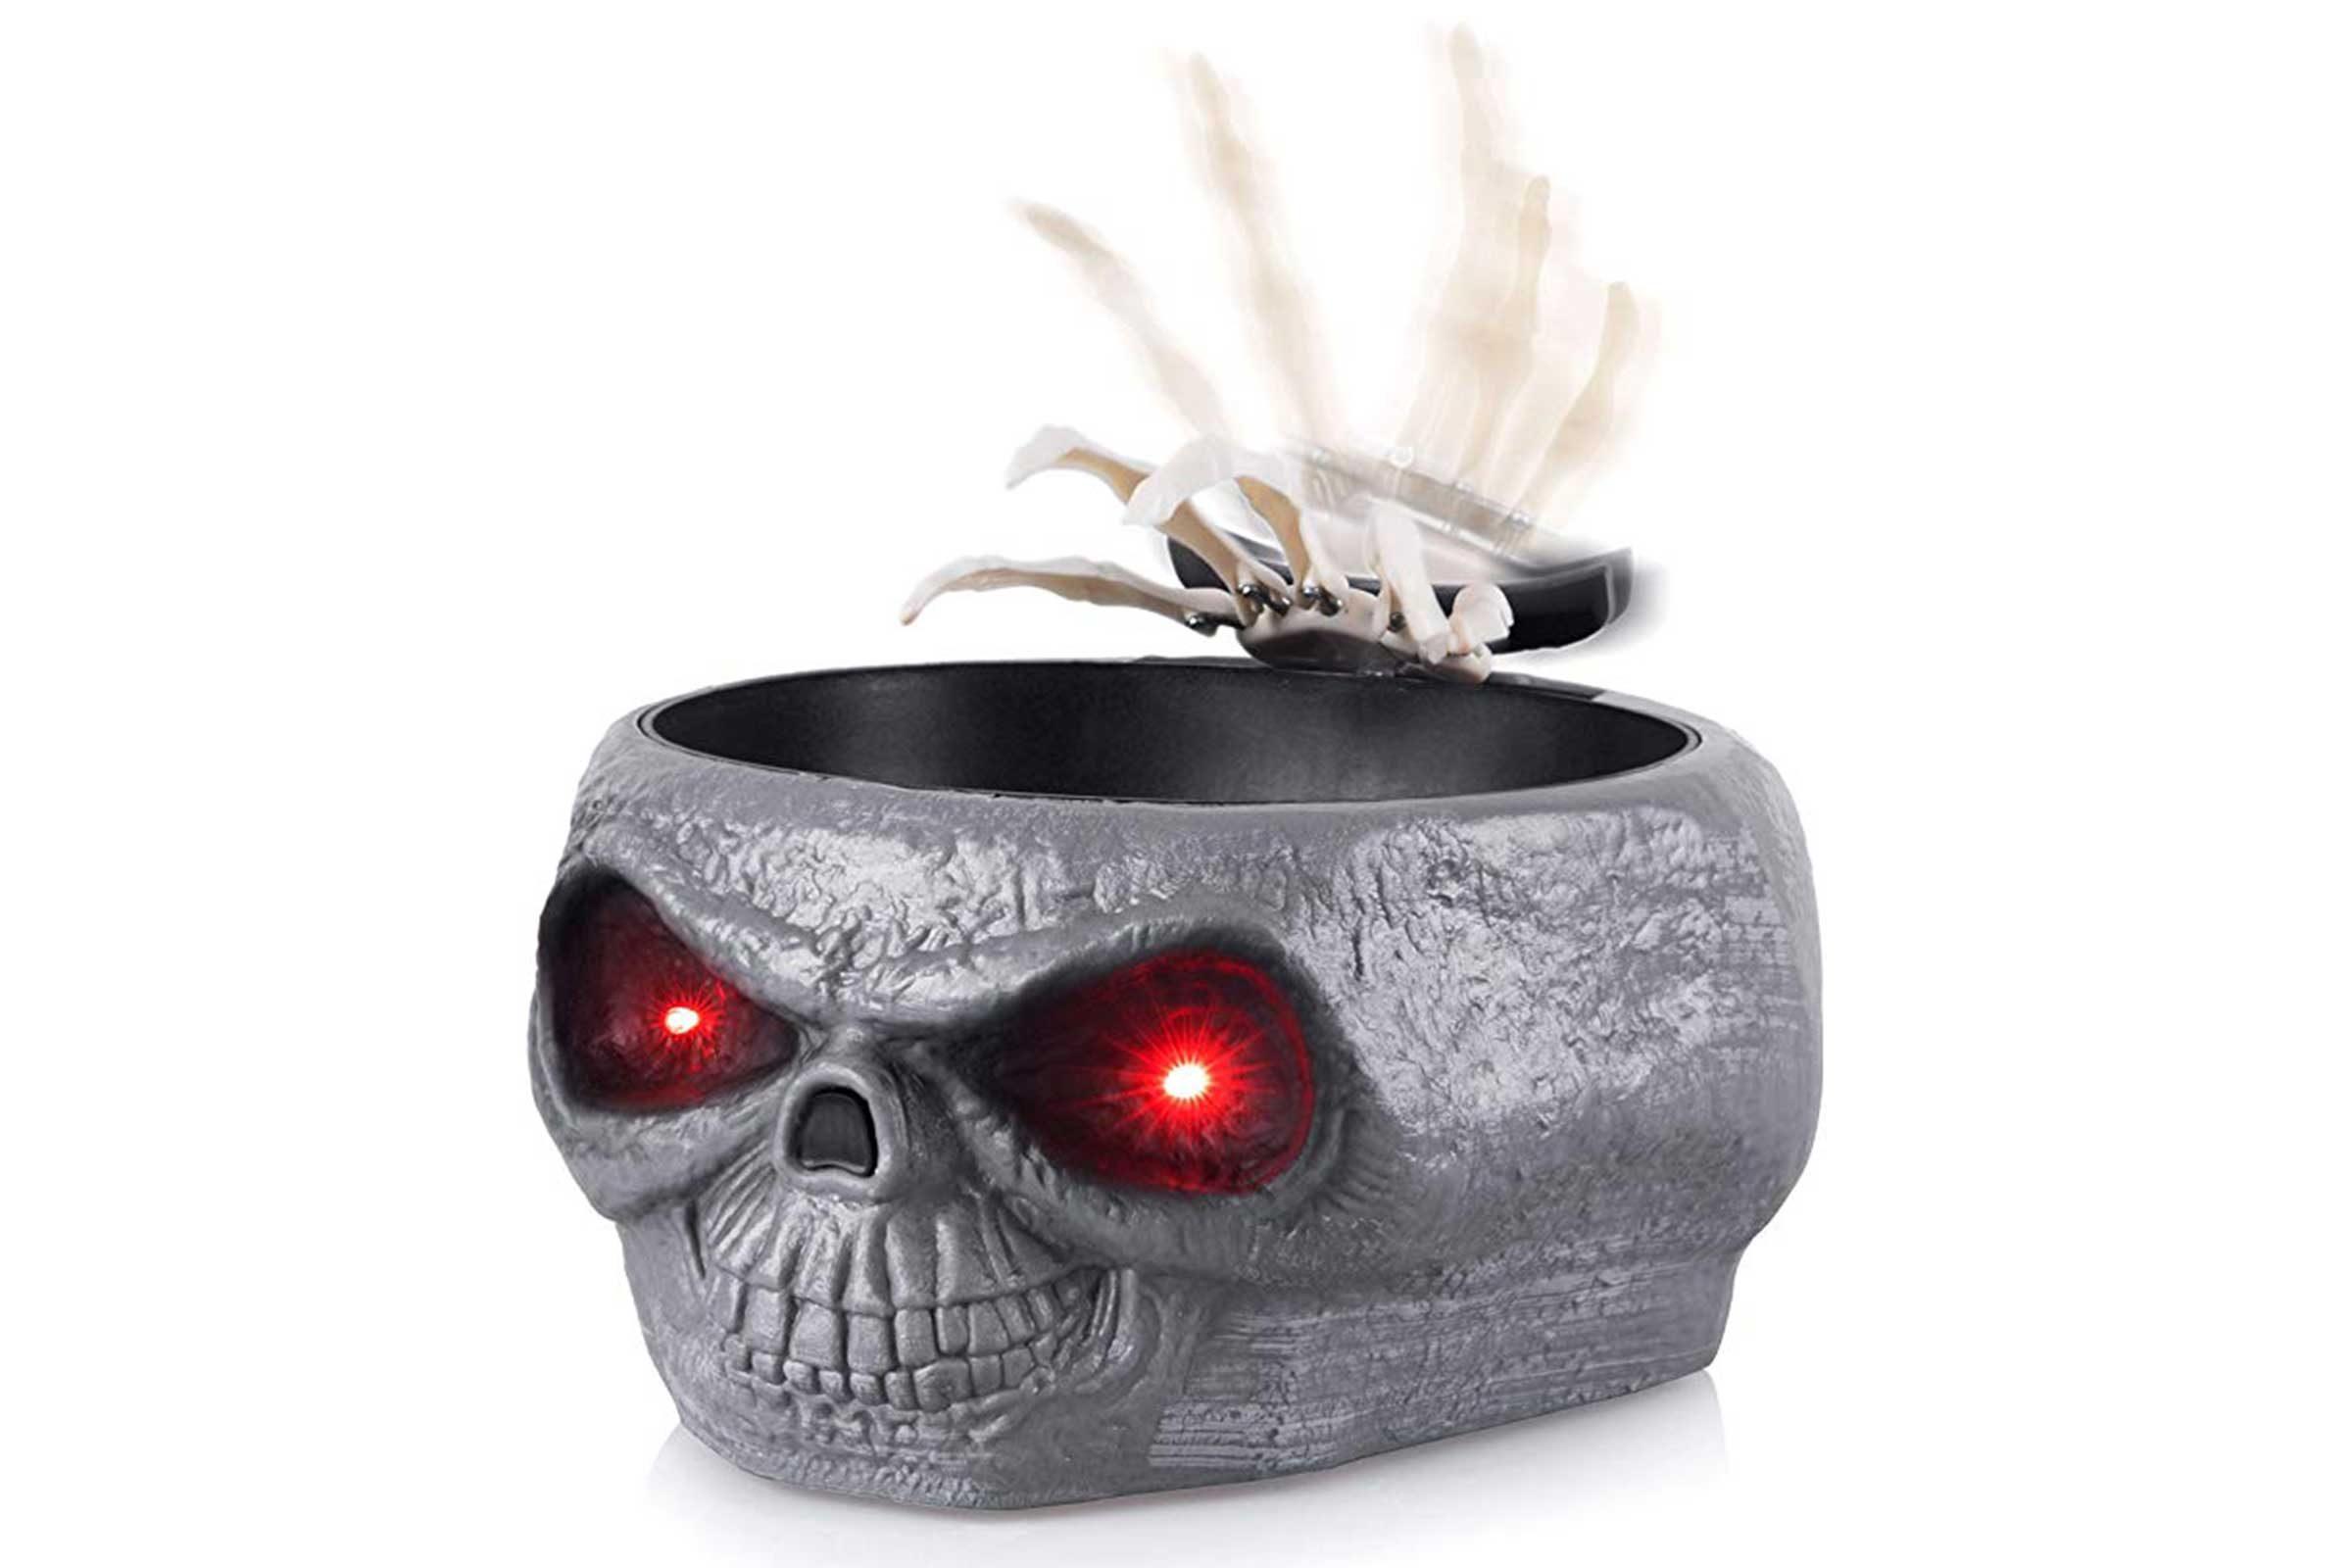 Skullcandy Koptelefoons - Winter Sale: Tot -30% Korting